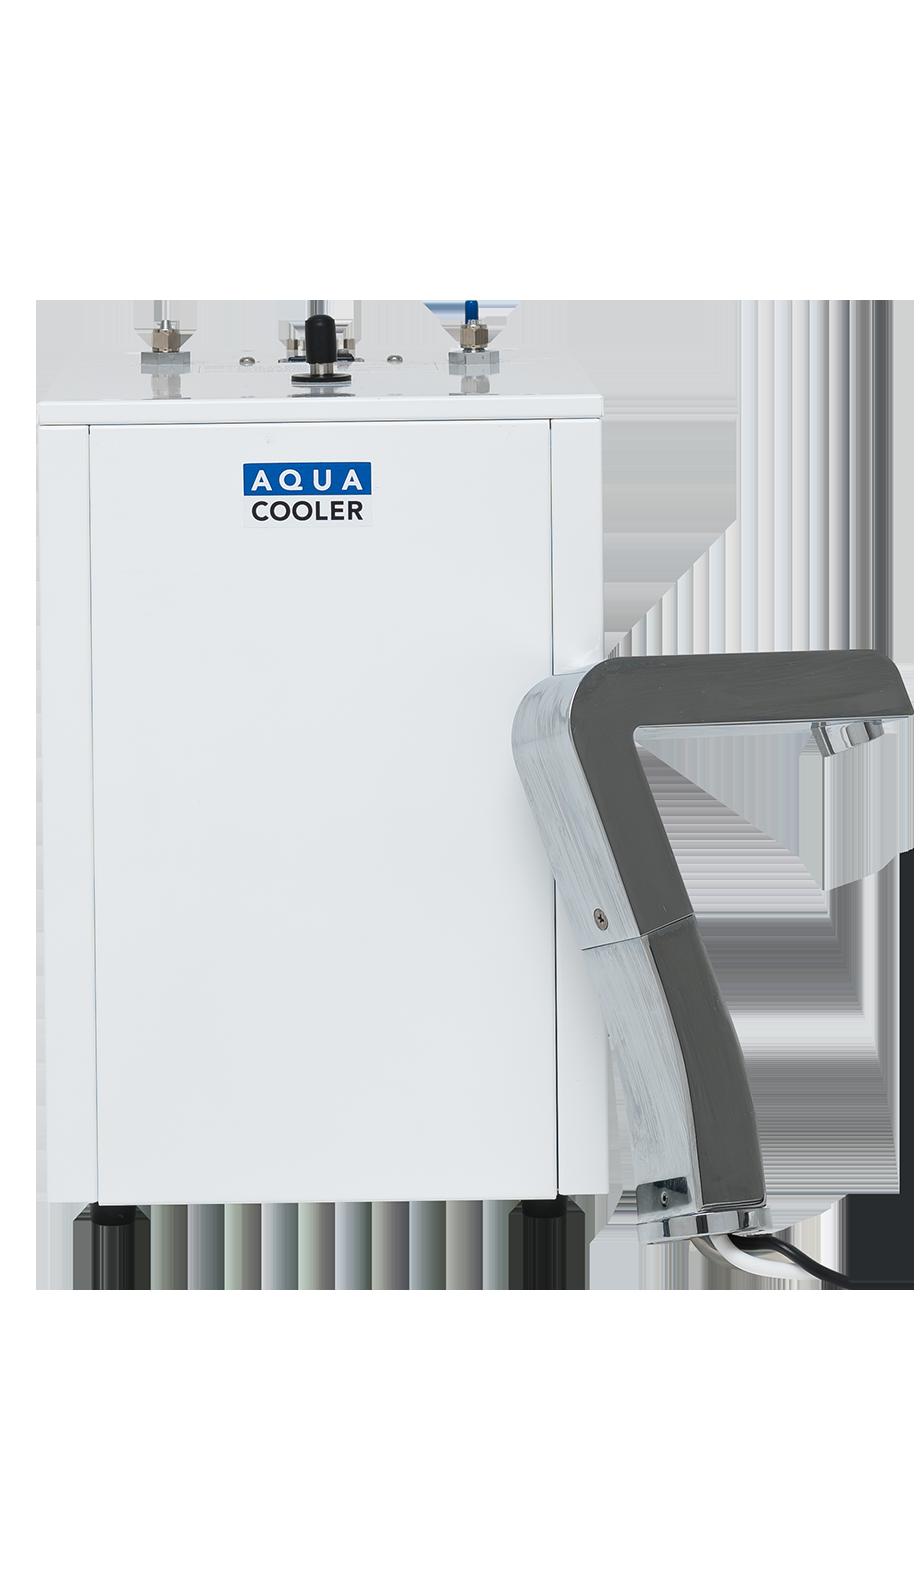 H2o Presto Boiler Aqua Cooler